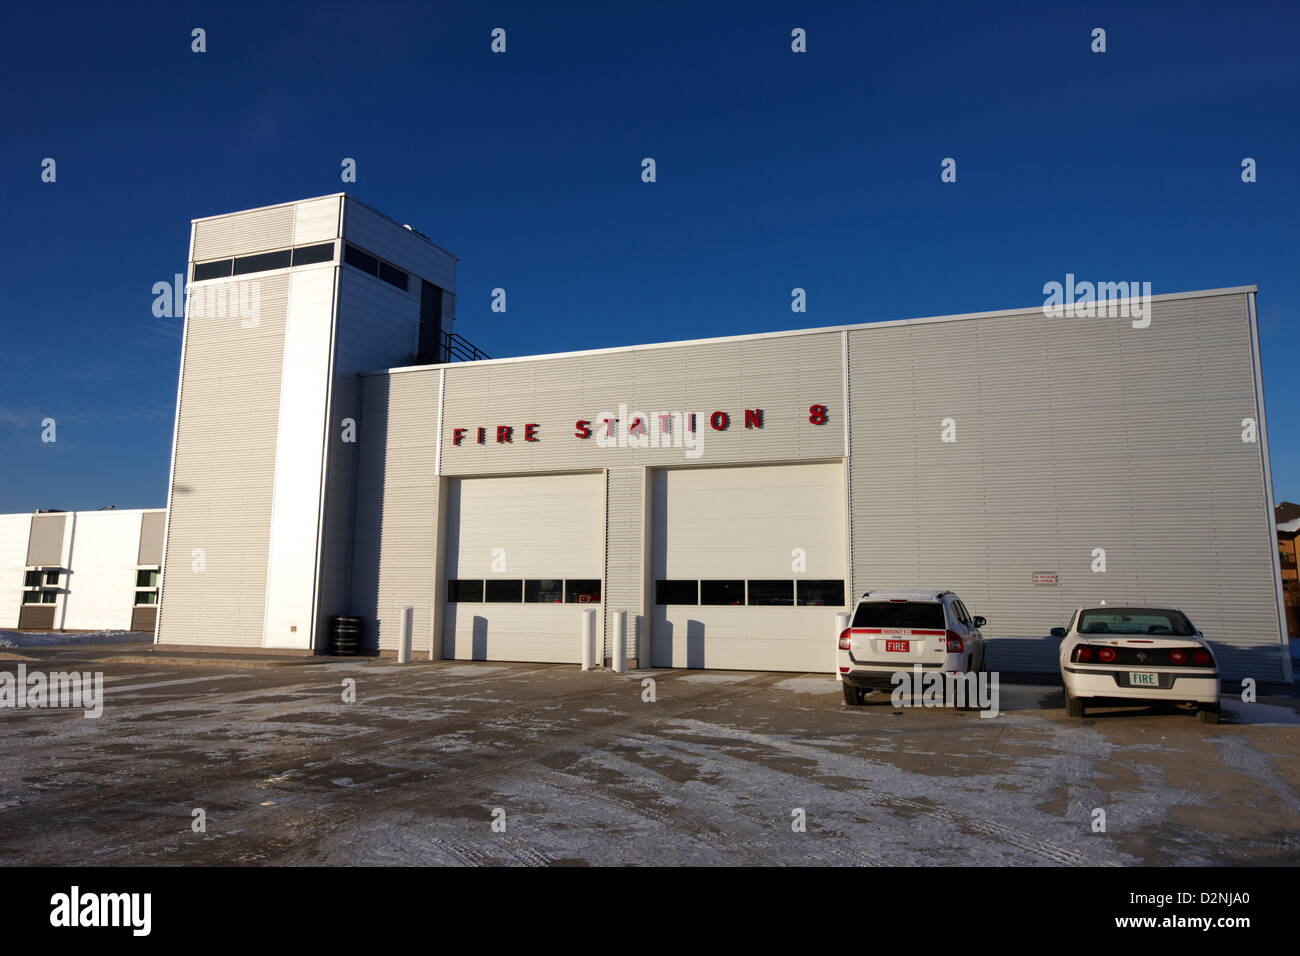 slimmon road fire station Saskatoon Saskatchewan Canada - Stock Image